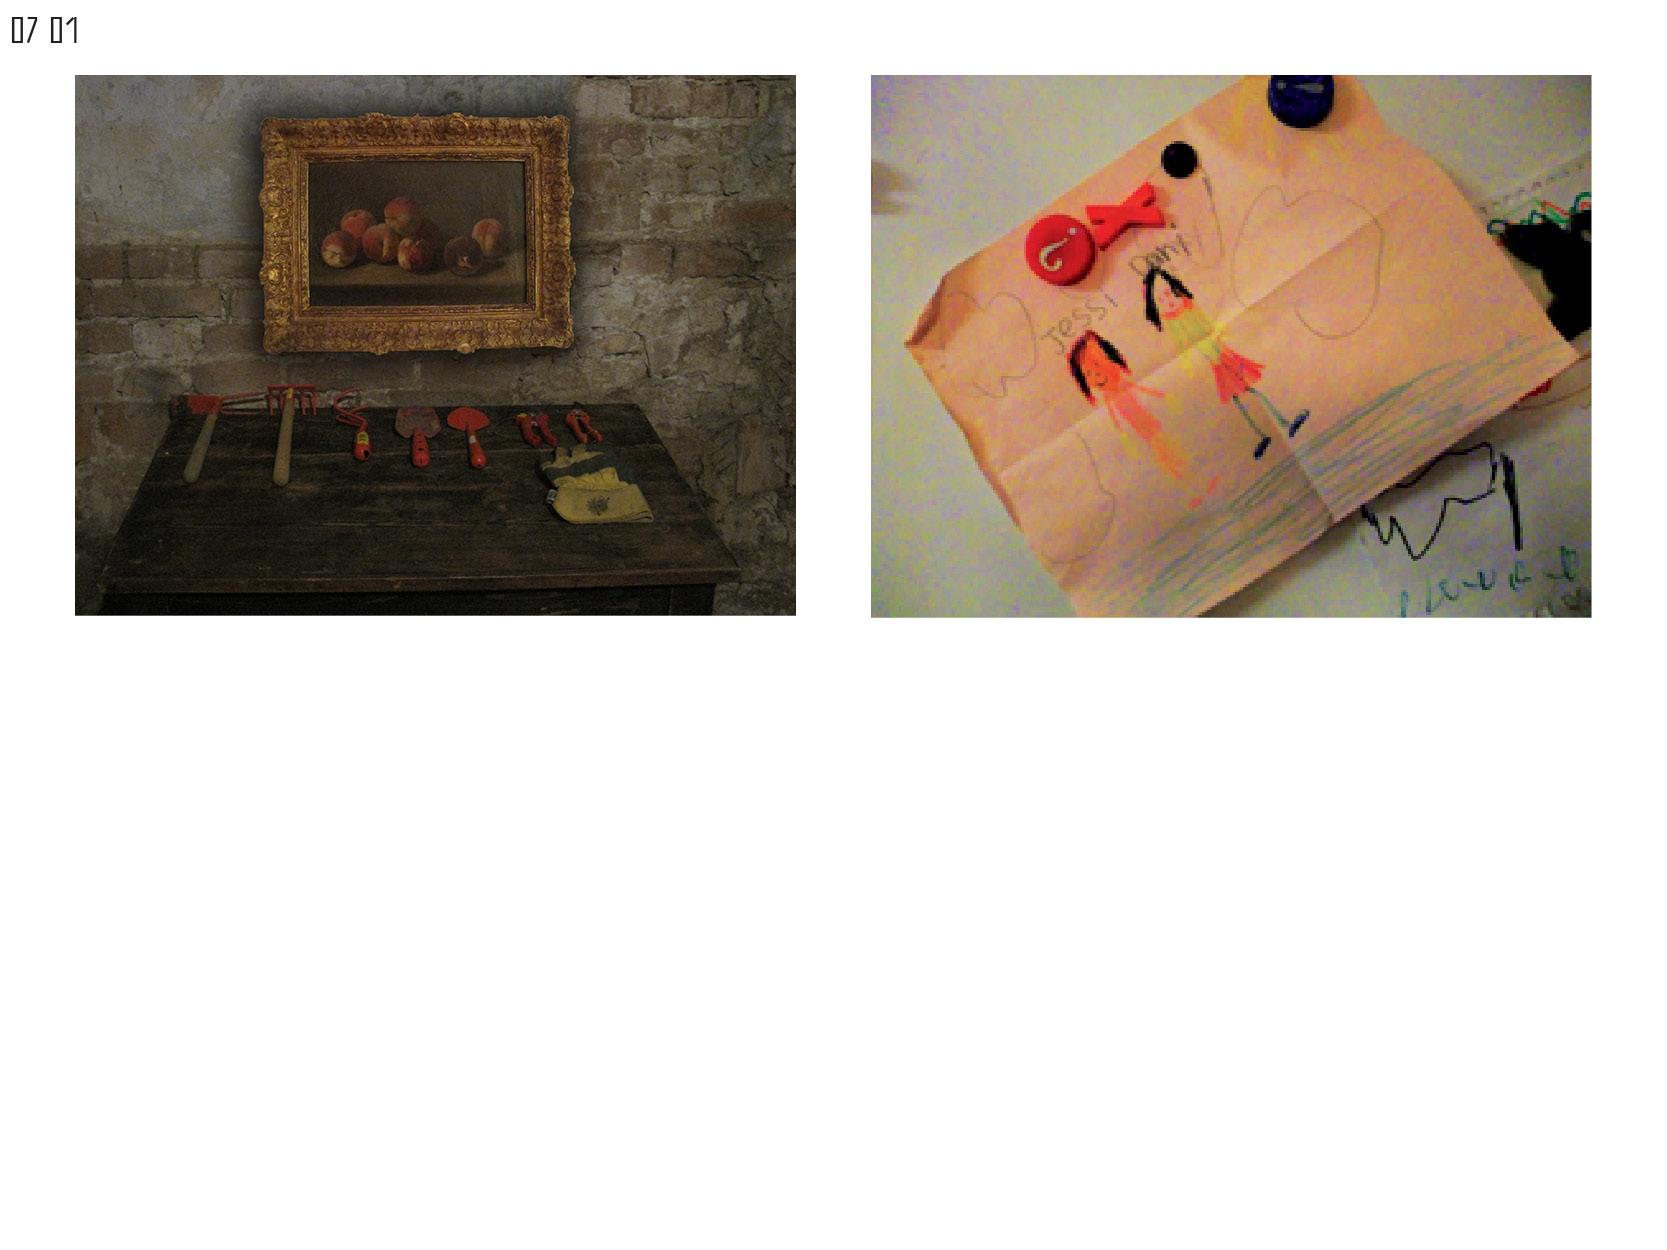 Gerrit-Schweiger-Dialog-Städte-Paris-Berlin-Jessica-Blank-Experiment-Fotoserie-Tagebuch-visuelle-Kommunikation-68